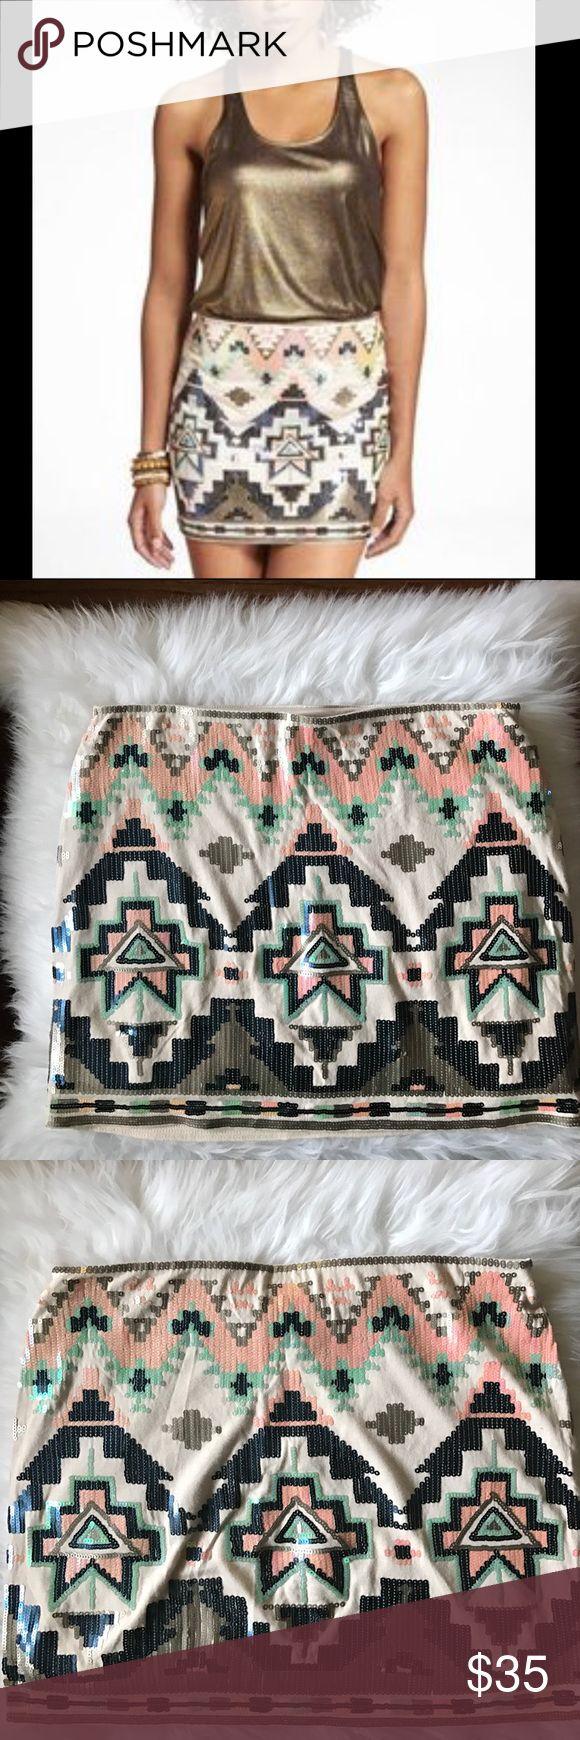 Express Sequin Mini Skirt Tribal print express sequin mini skirt. Measures 14 inches from waist to hem. Express Skirts Mini